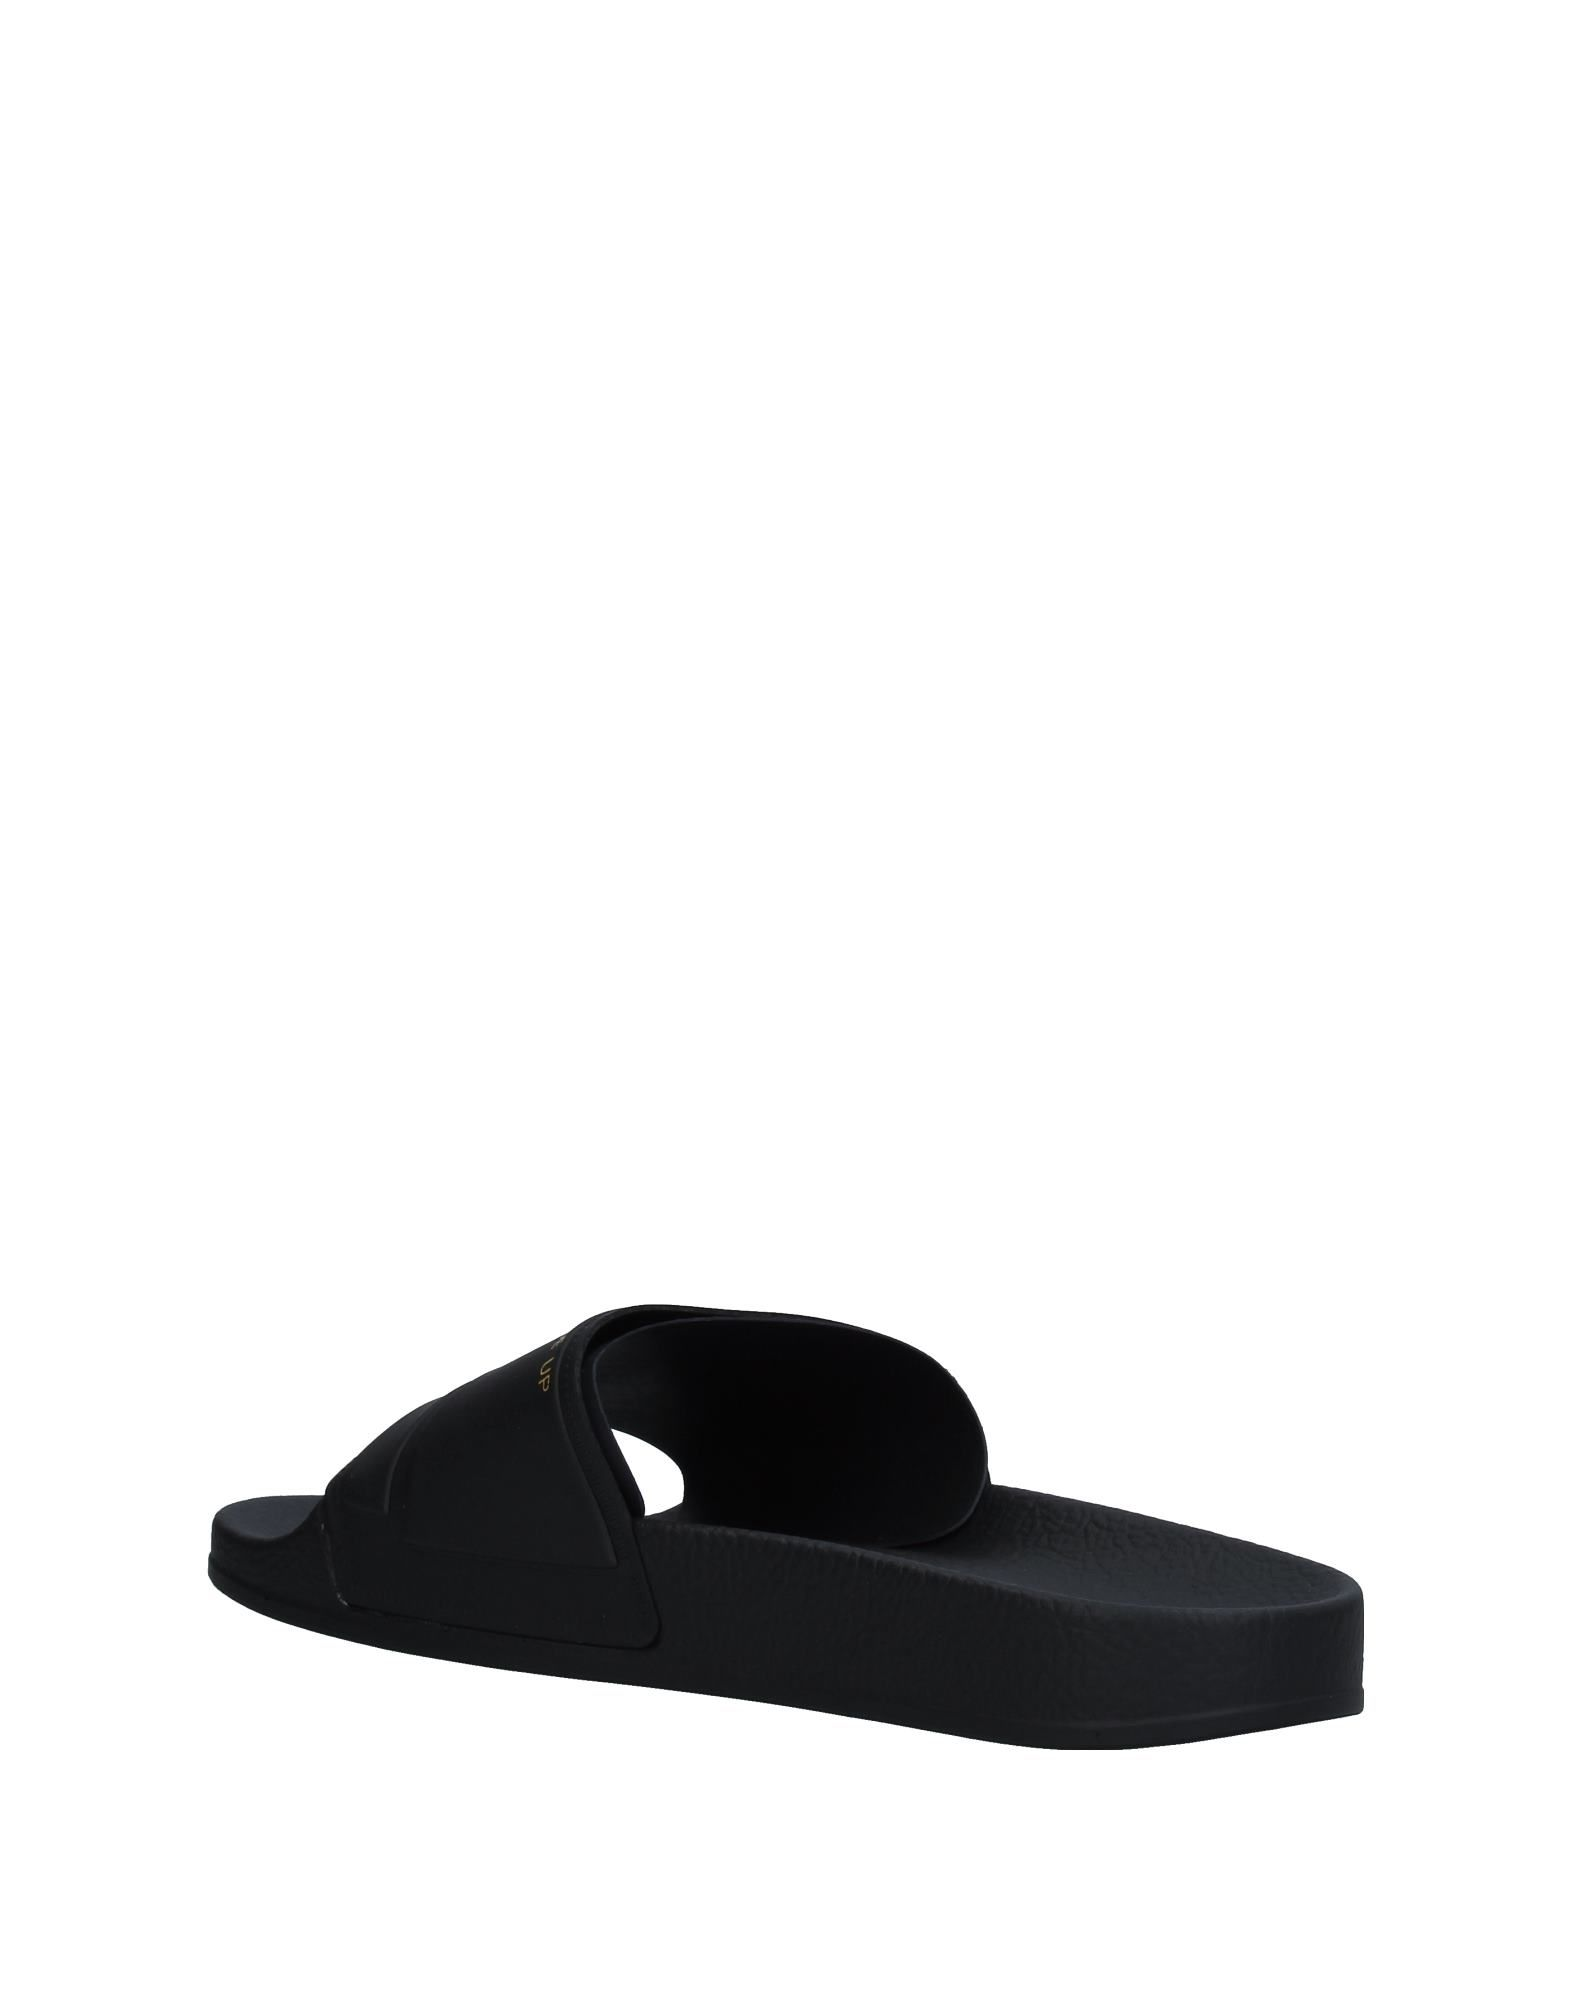 Sandales Adidas By Raf Simons Femme - Sandales Adidas By Raf Simons sur